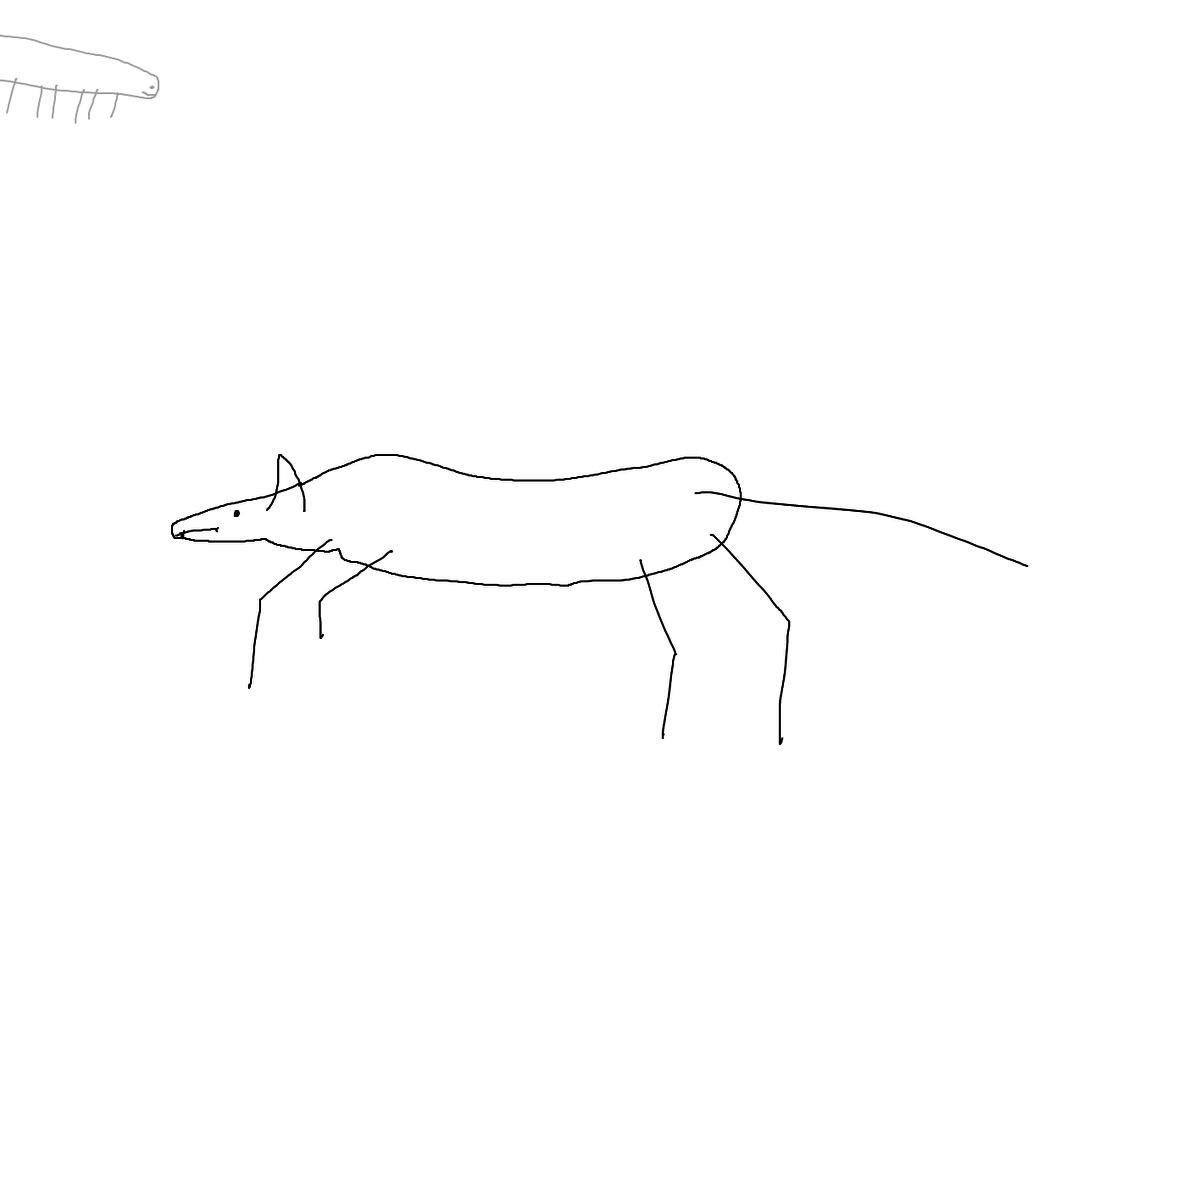 BAAAM drawing#2362 lat:52.4750022888183600lng: 13.4070062637329100